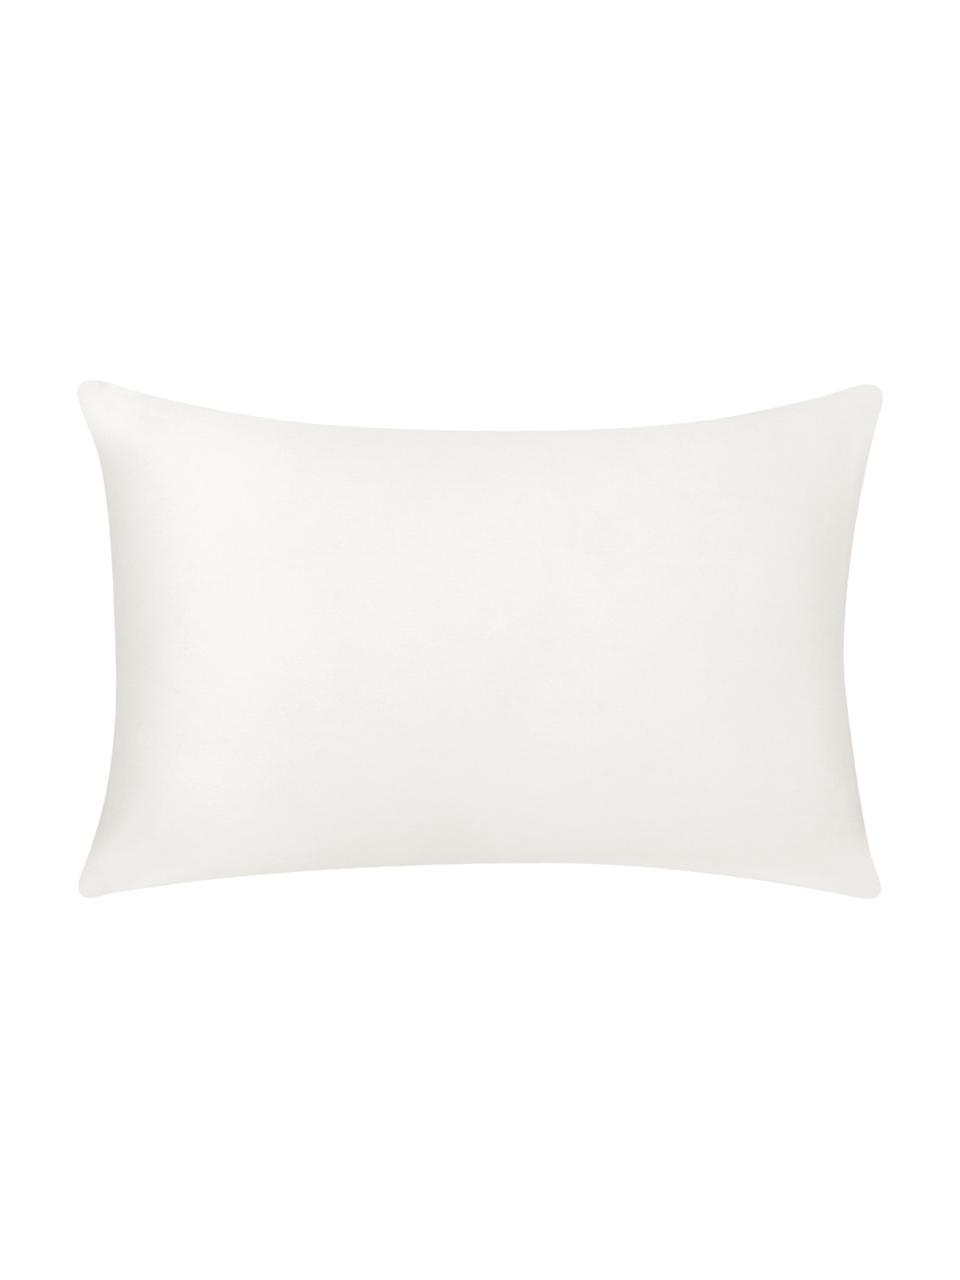 Federa arredo in cotone bianco Mads, 100% cotone, Bianco crema, Larg. 30 x Lung. 50 cm